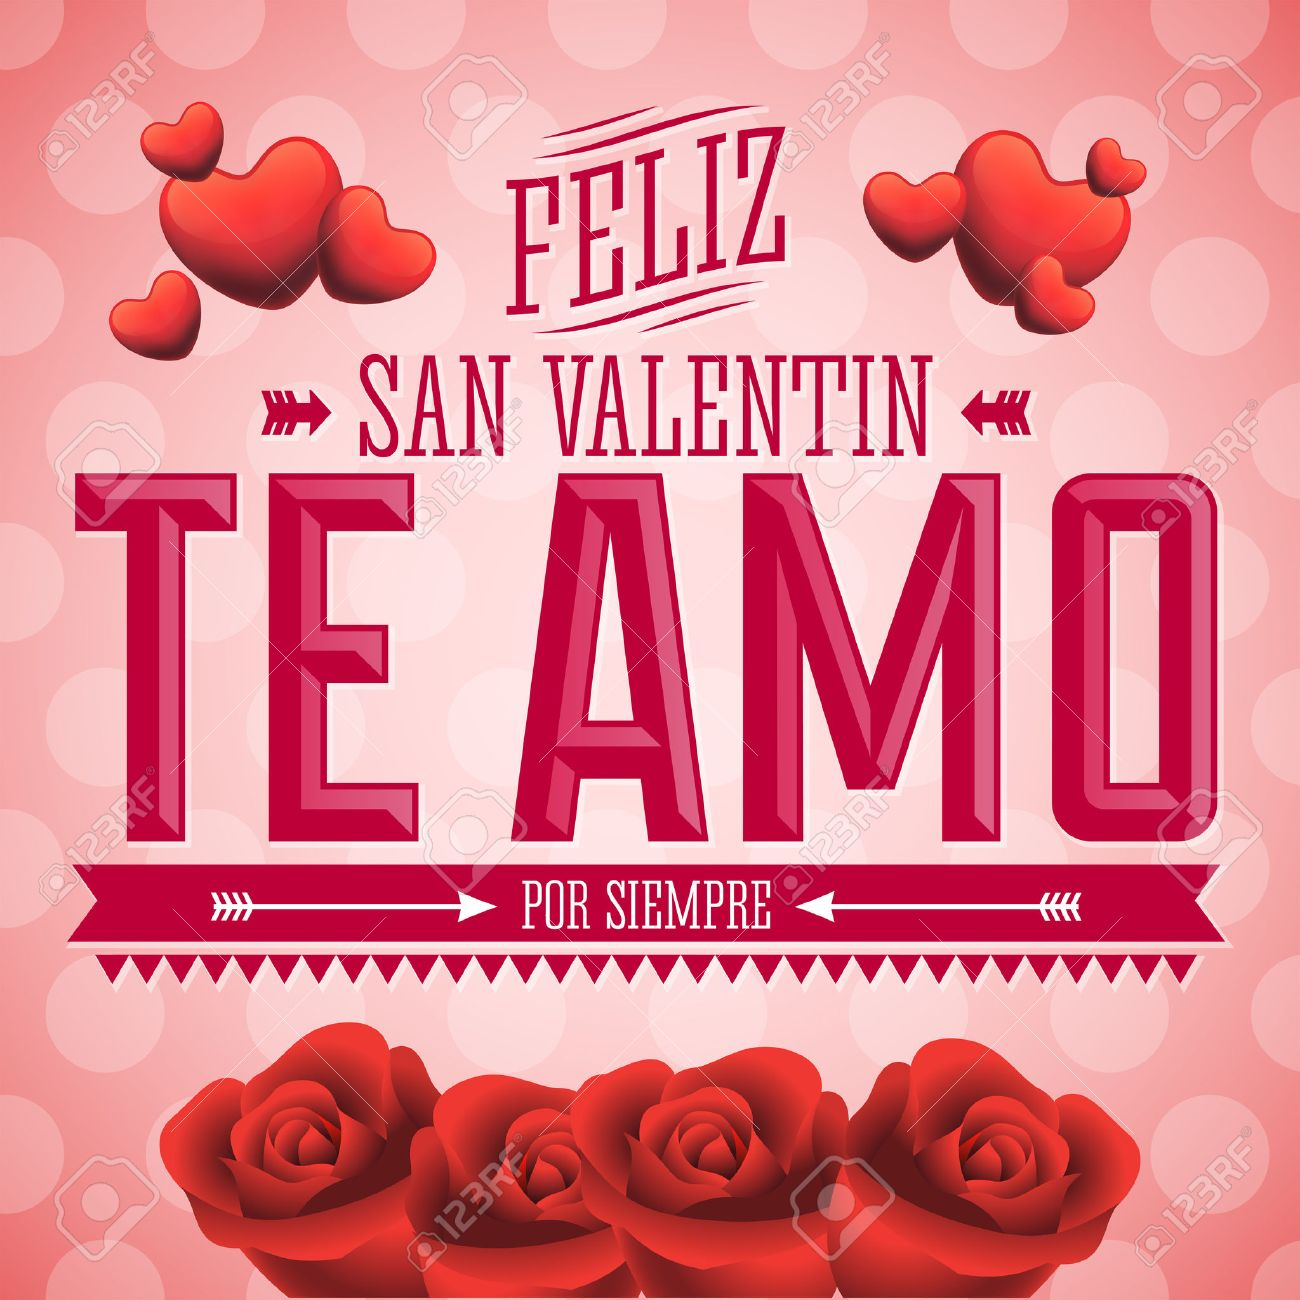 Te Amo Feliz San Valentin I Love You Happy Valentines Day Spanish